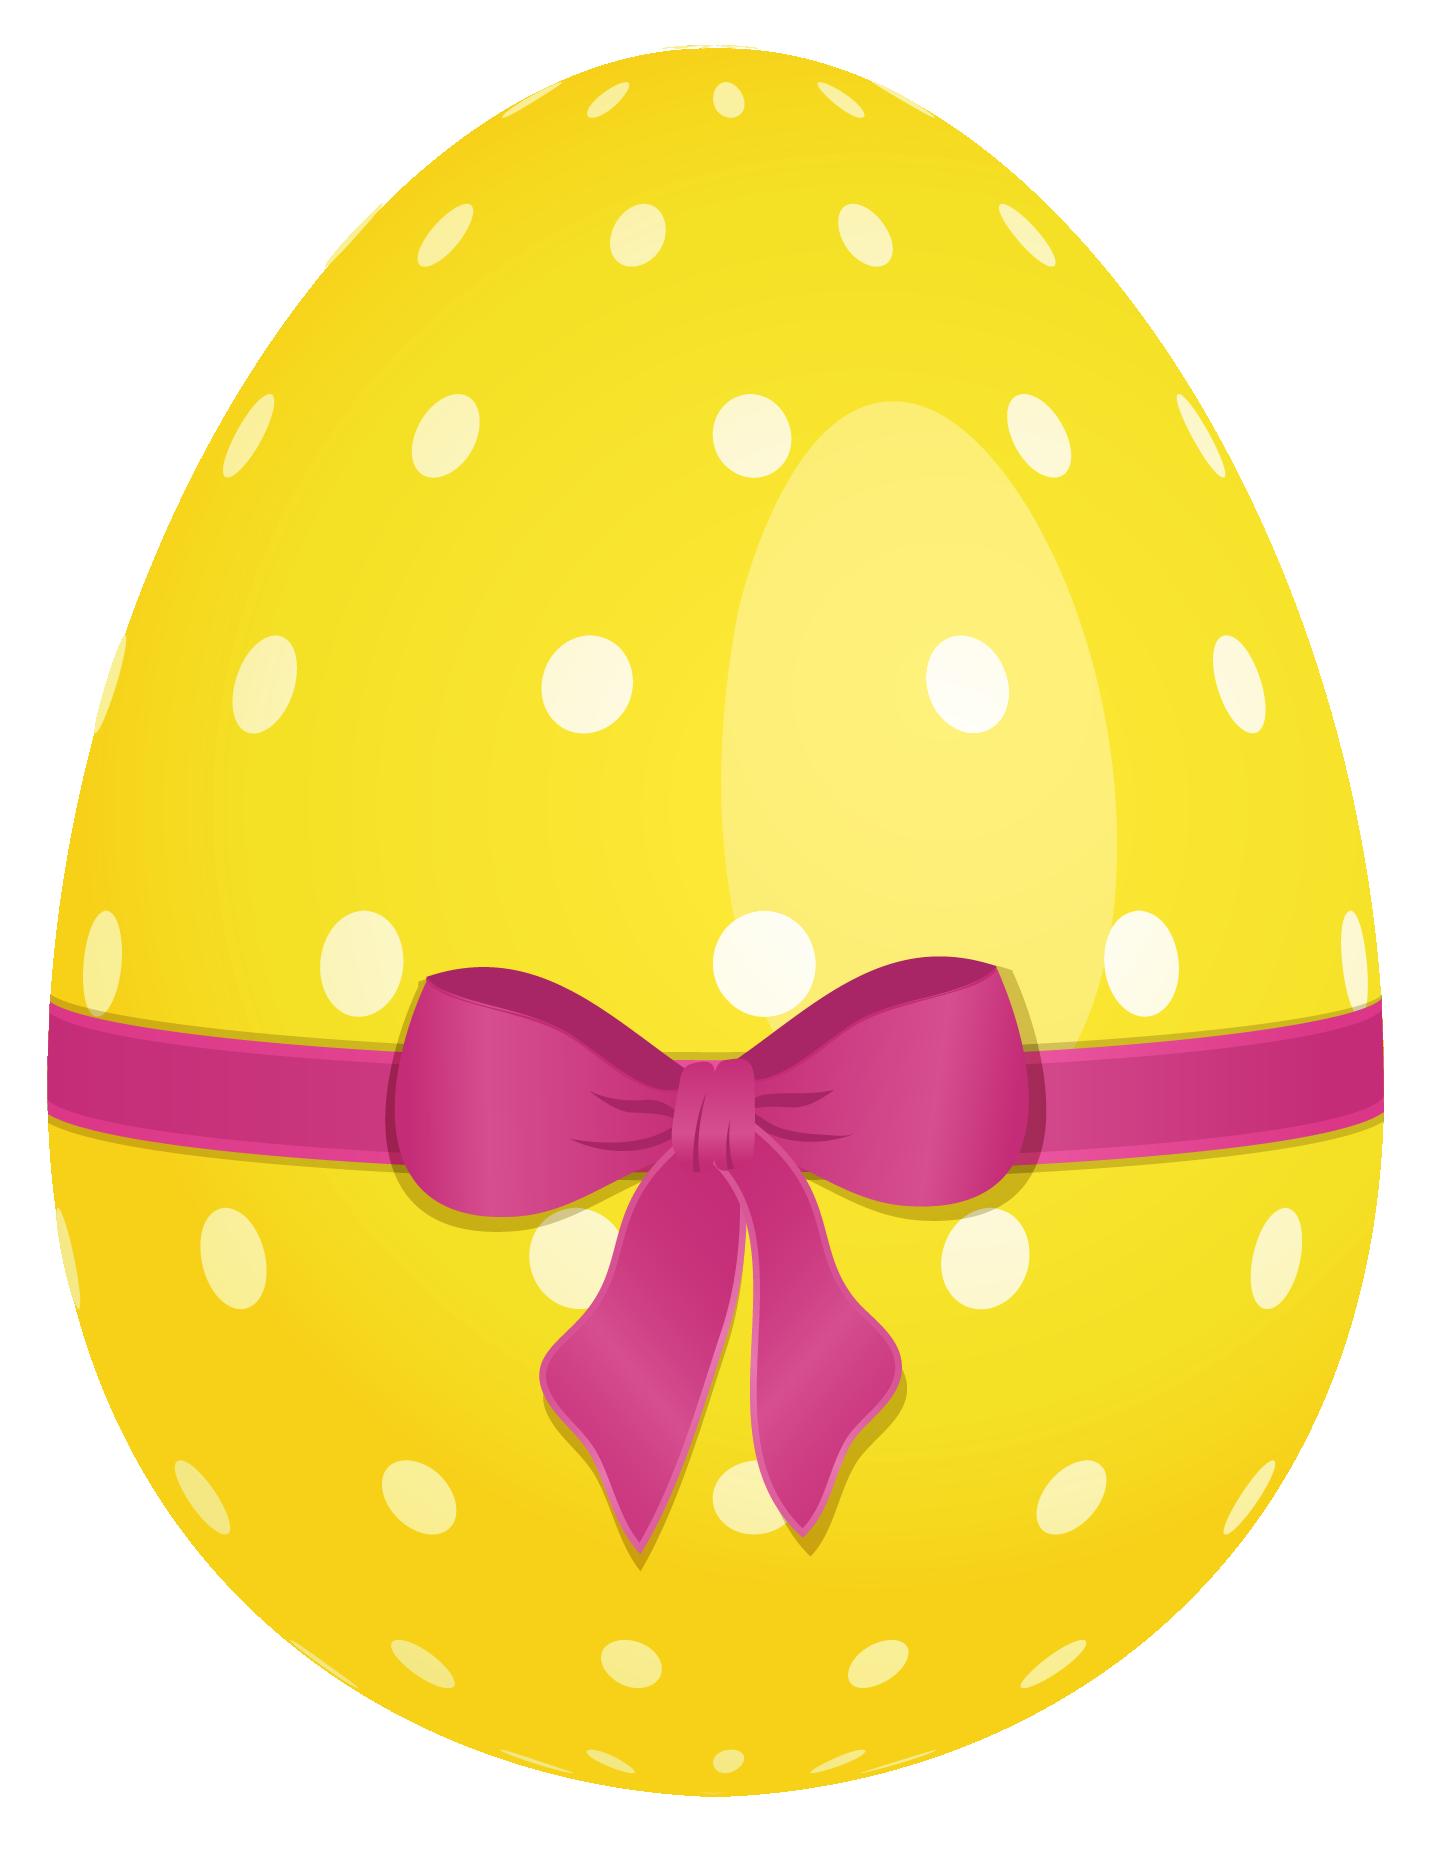 1440x1855 Egg Clipart Polka Dot